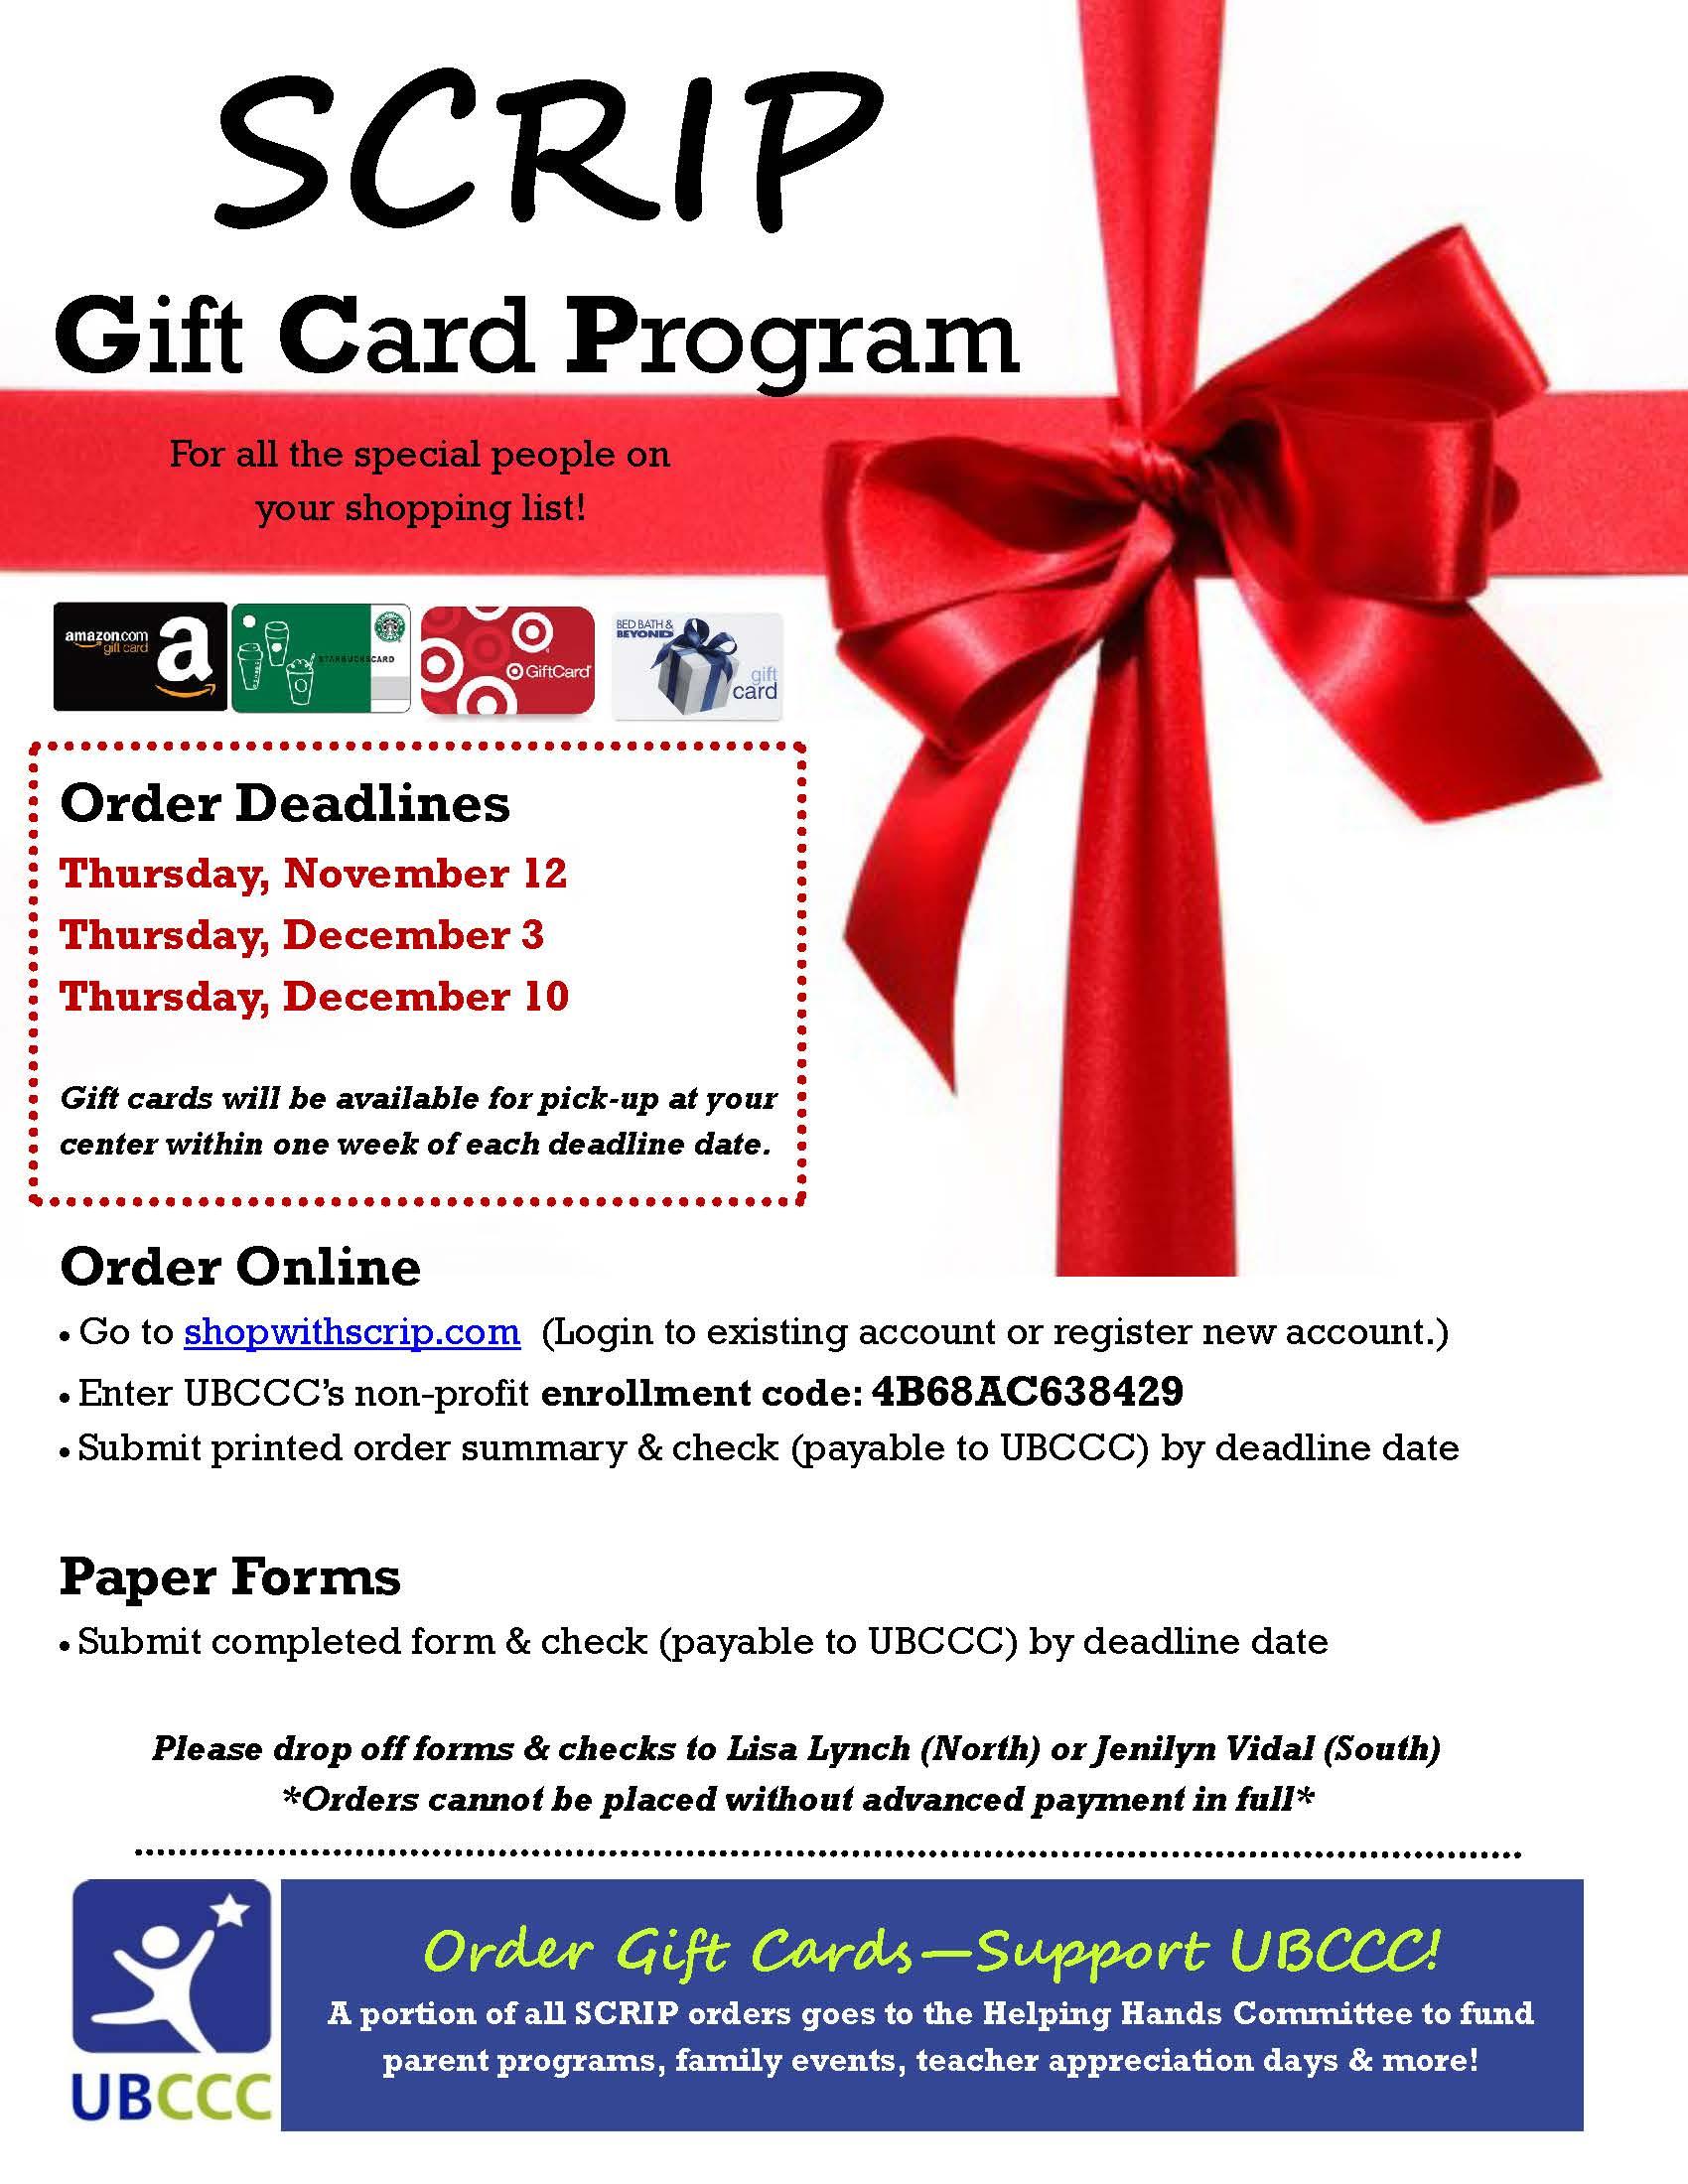 Annual SCRIP Gift Card Program University At Buffalo